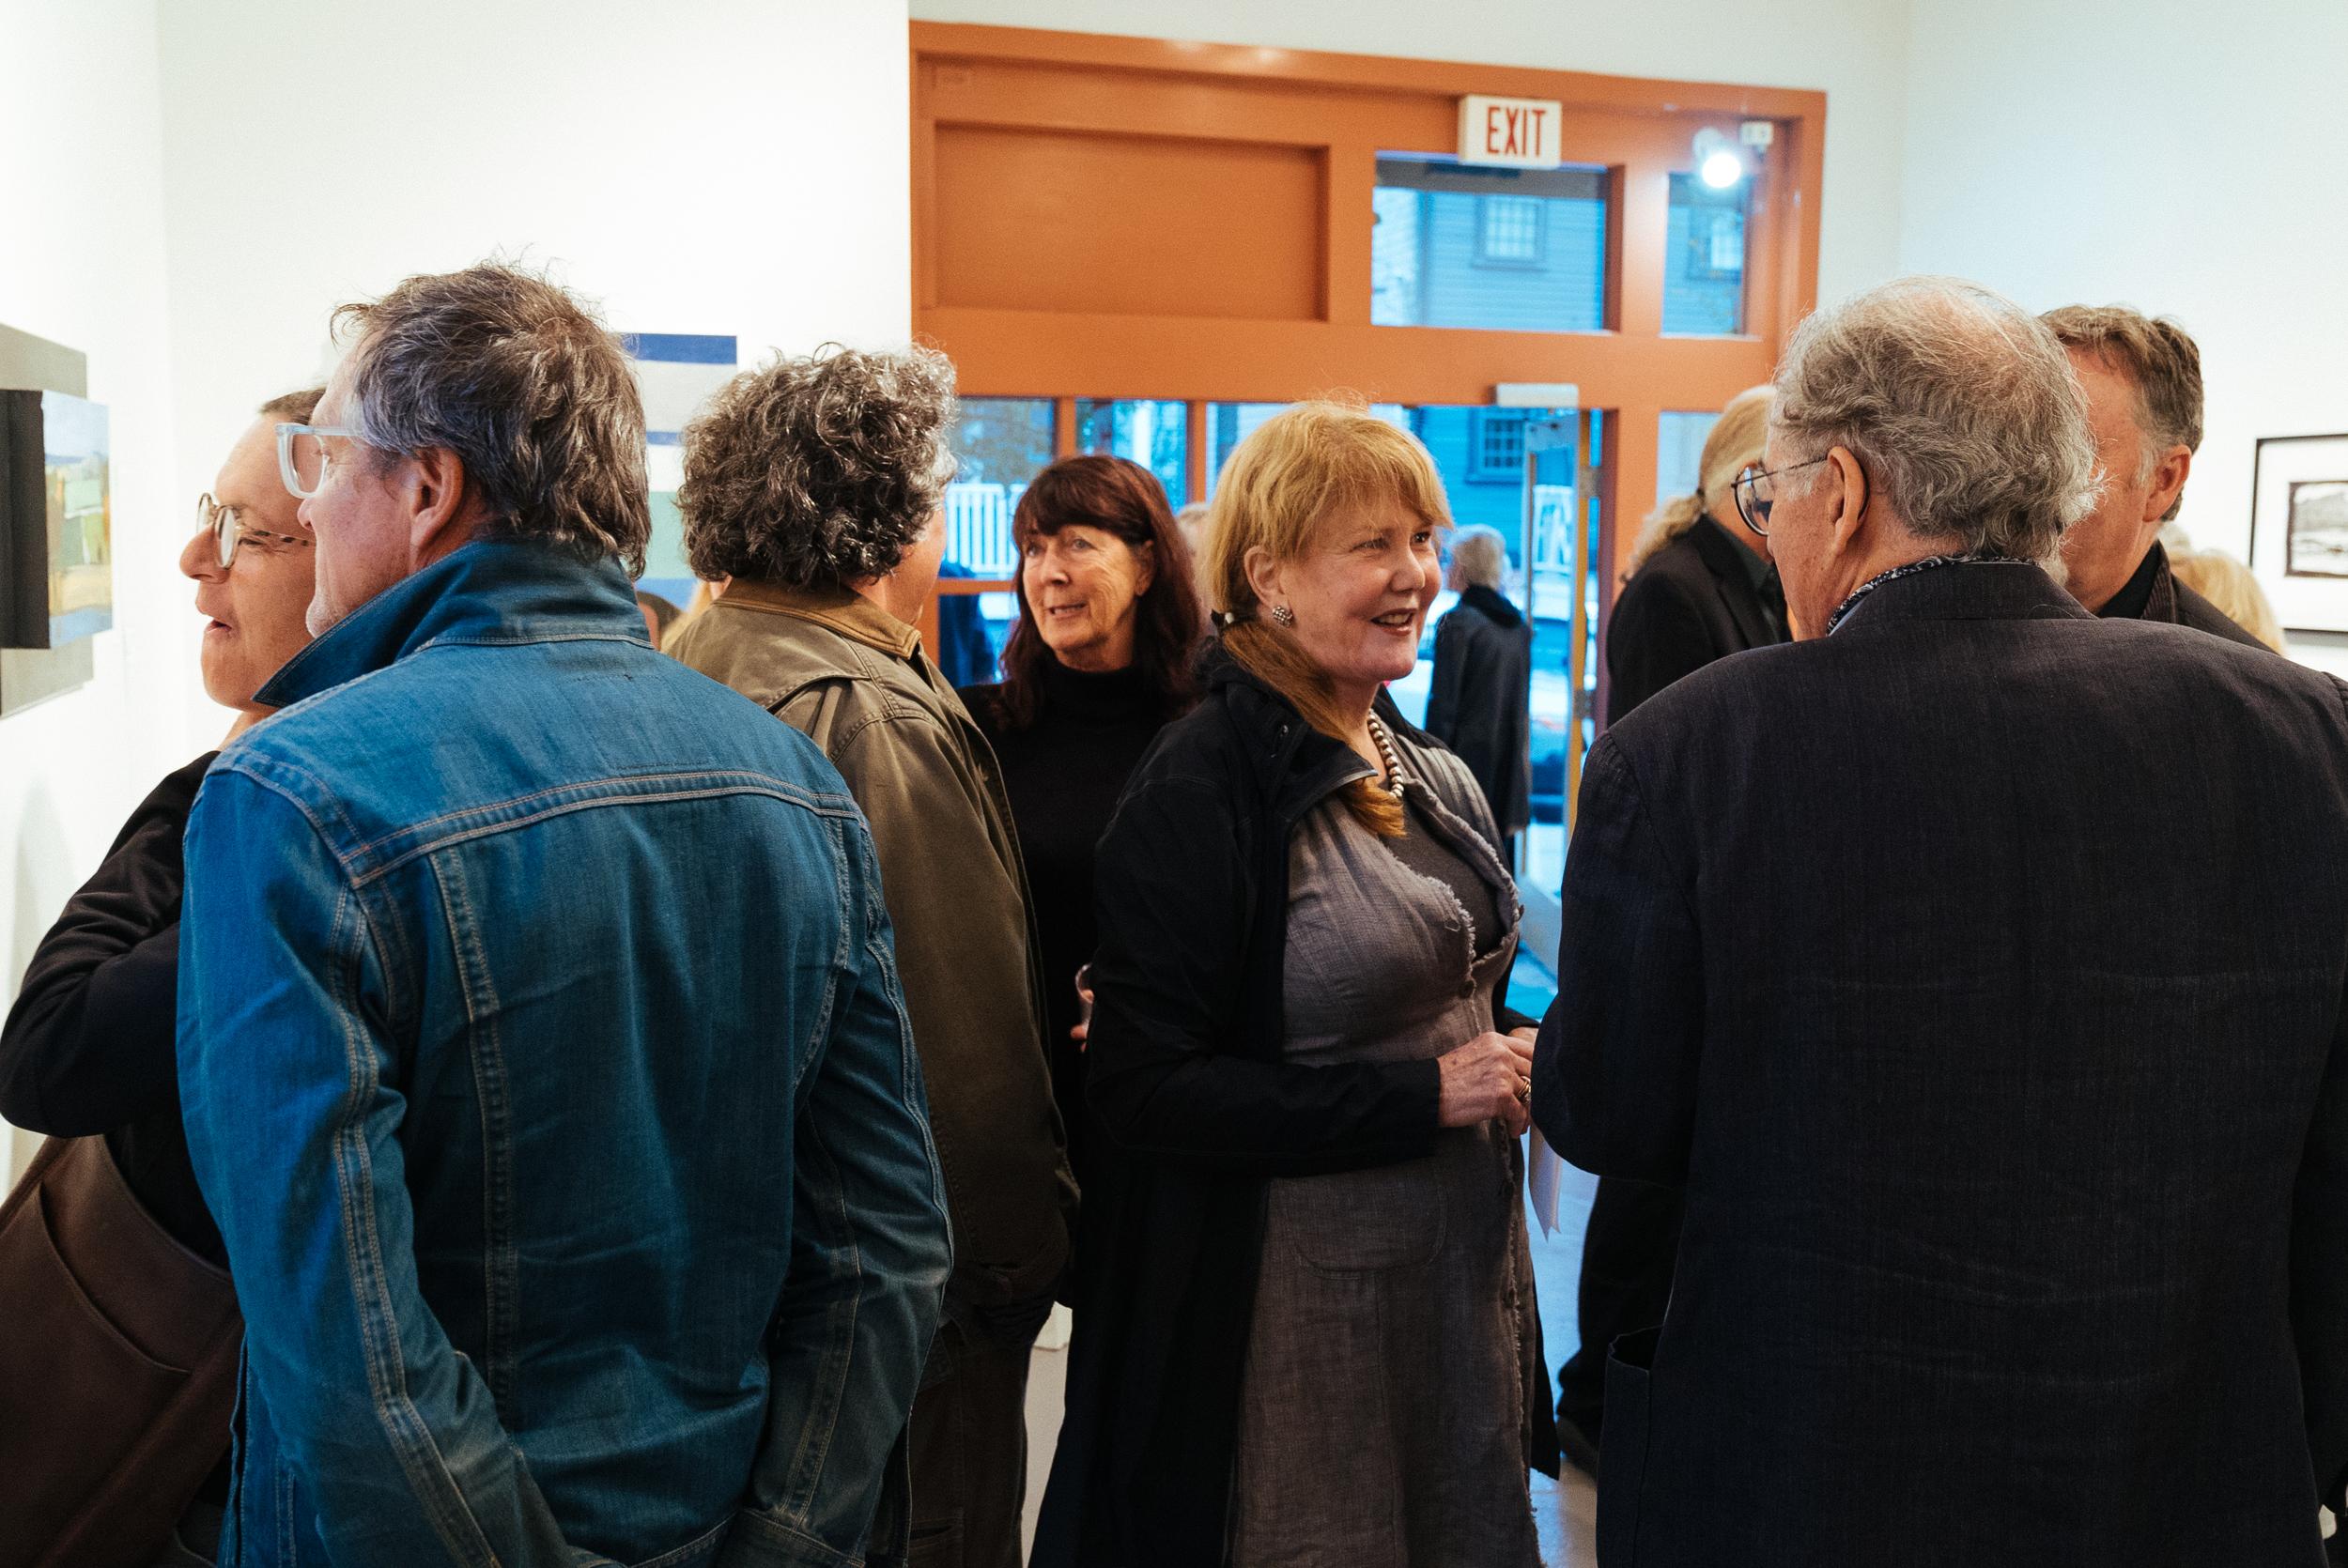 Christopher Benson Exhibit Opening